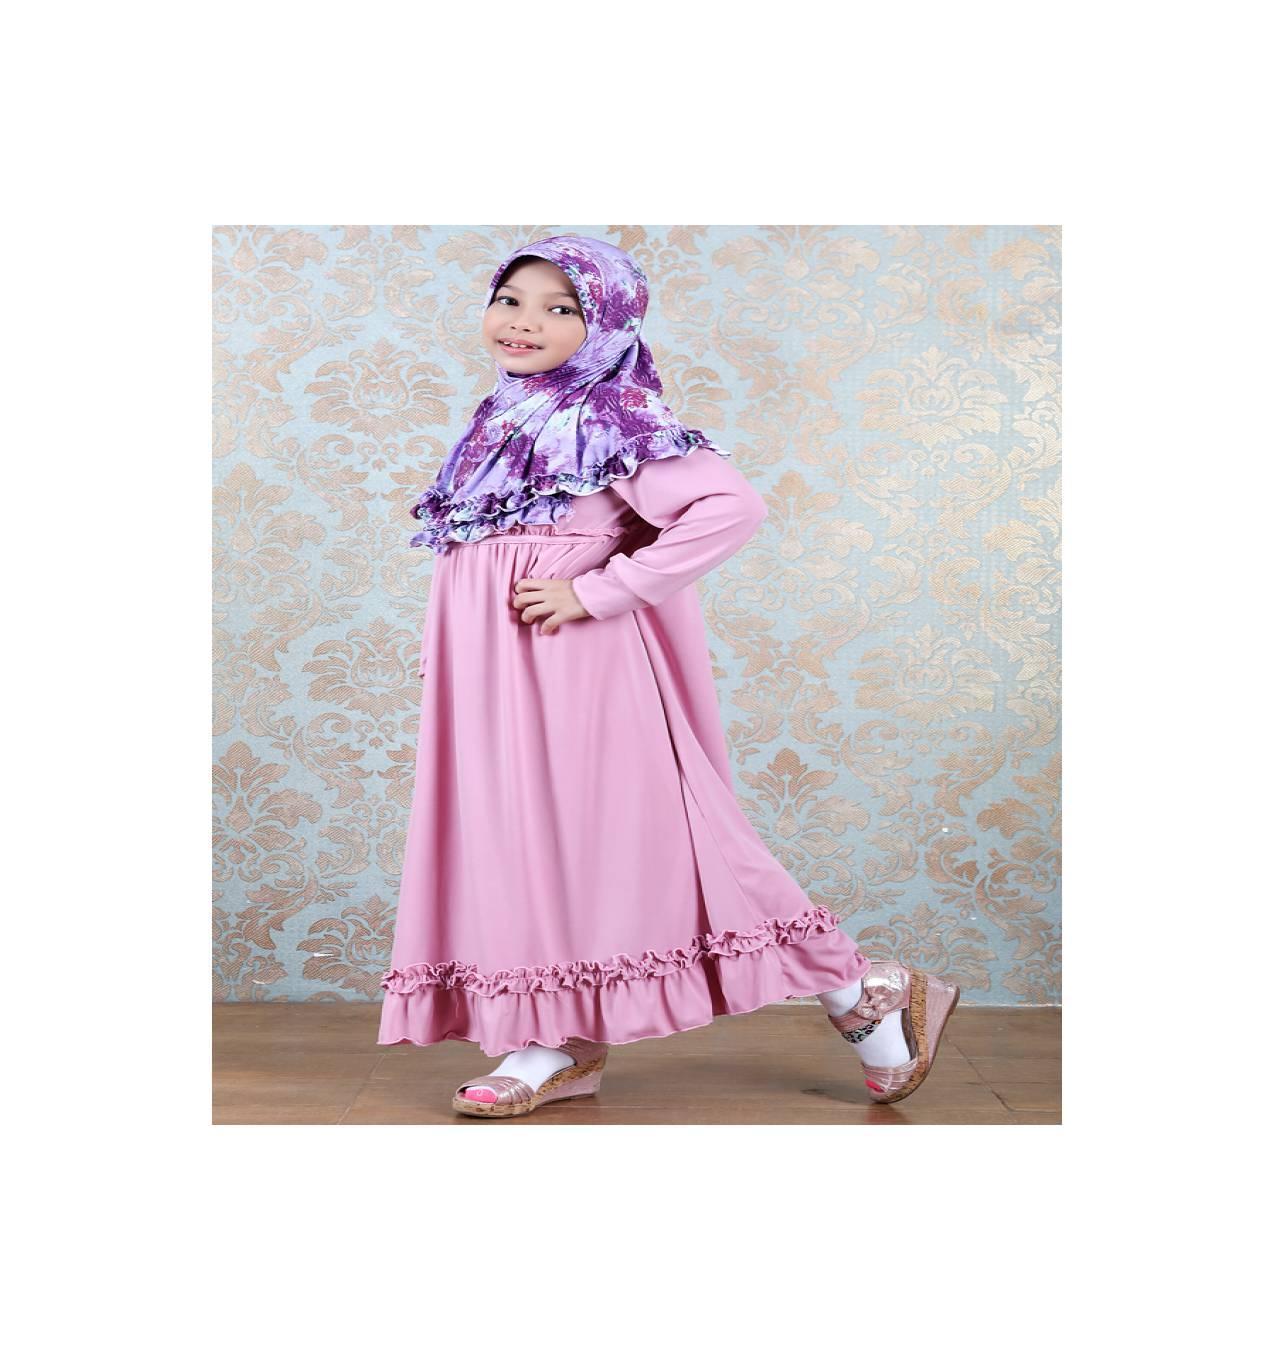 Azka Gamis Anak Shalimar Ga02 - Pink (l-xl)